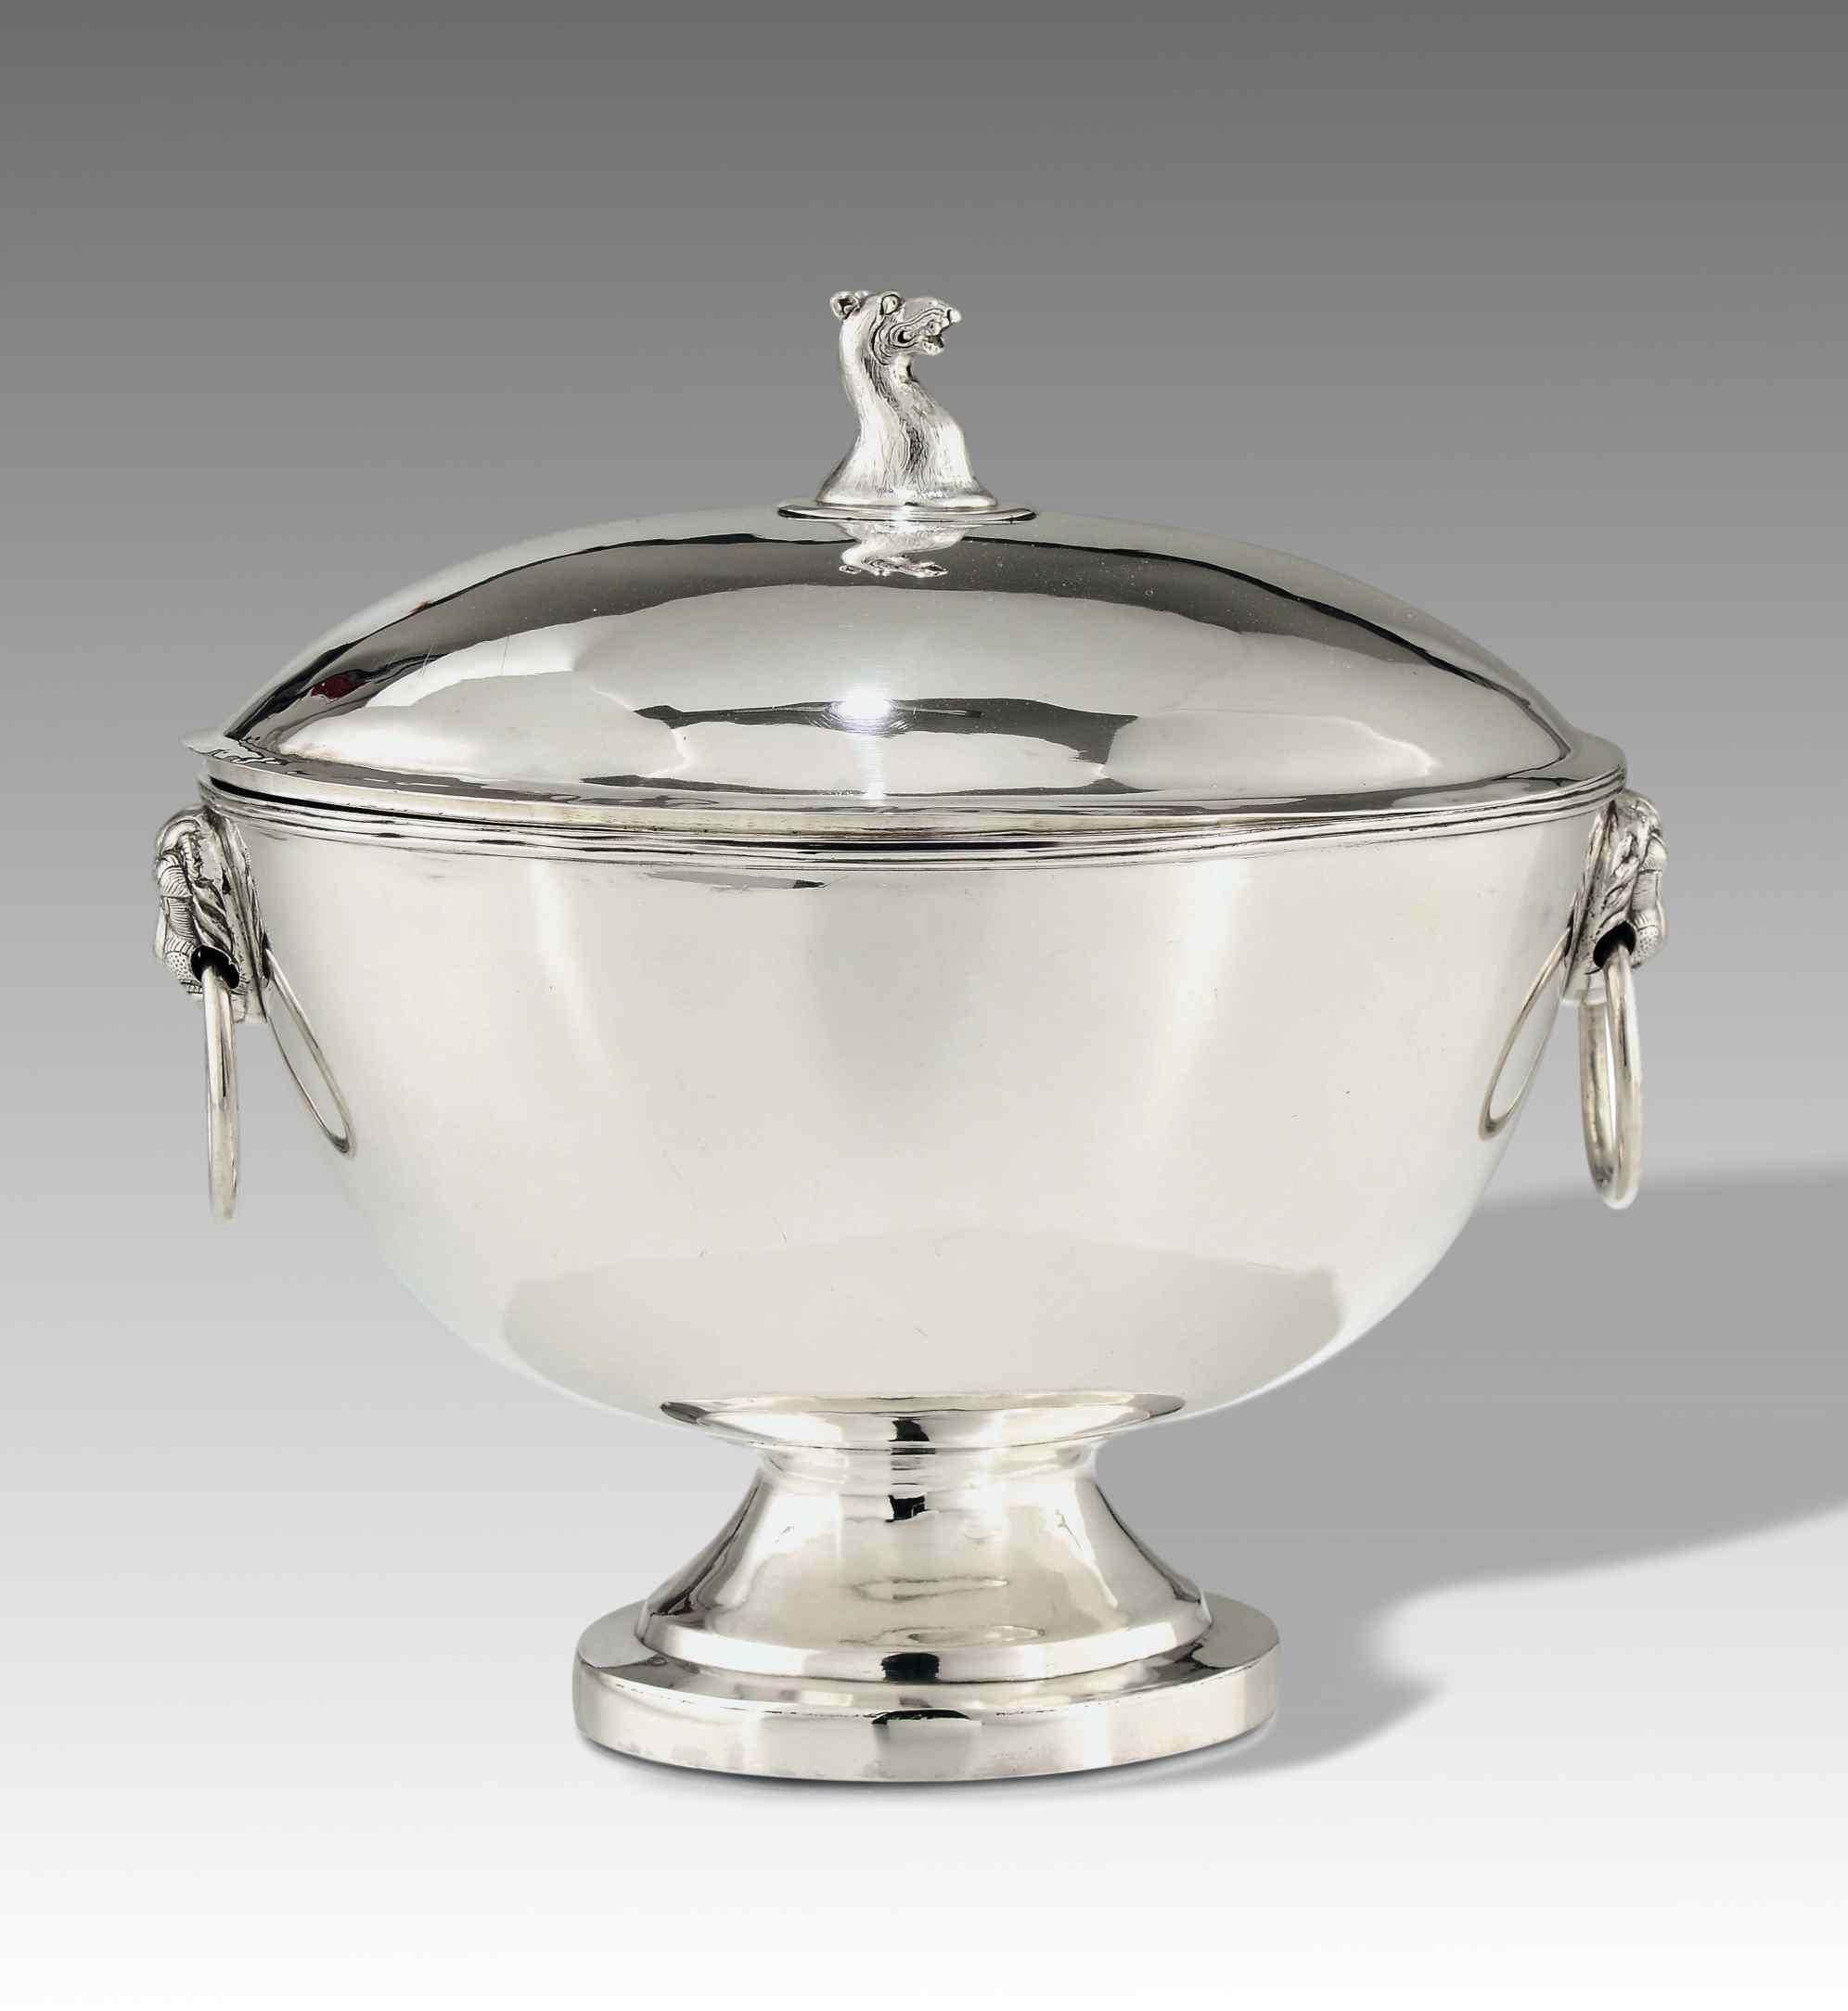 Zuppiera con coperchio, argento 925/, Inghilterra